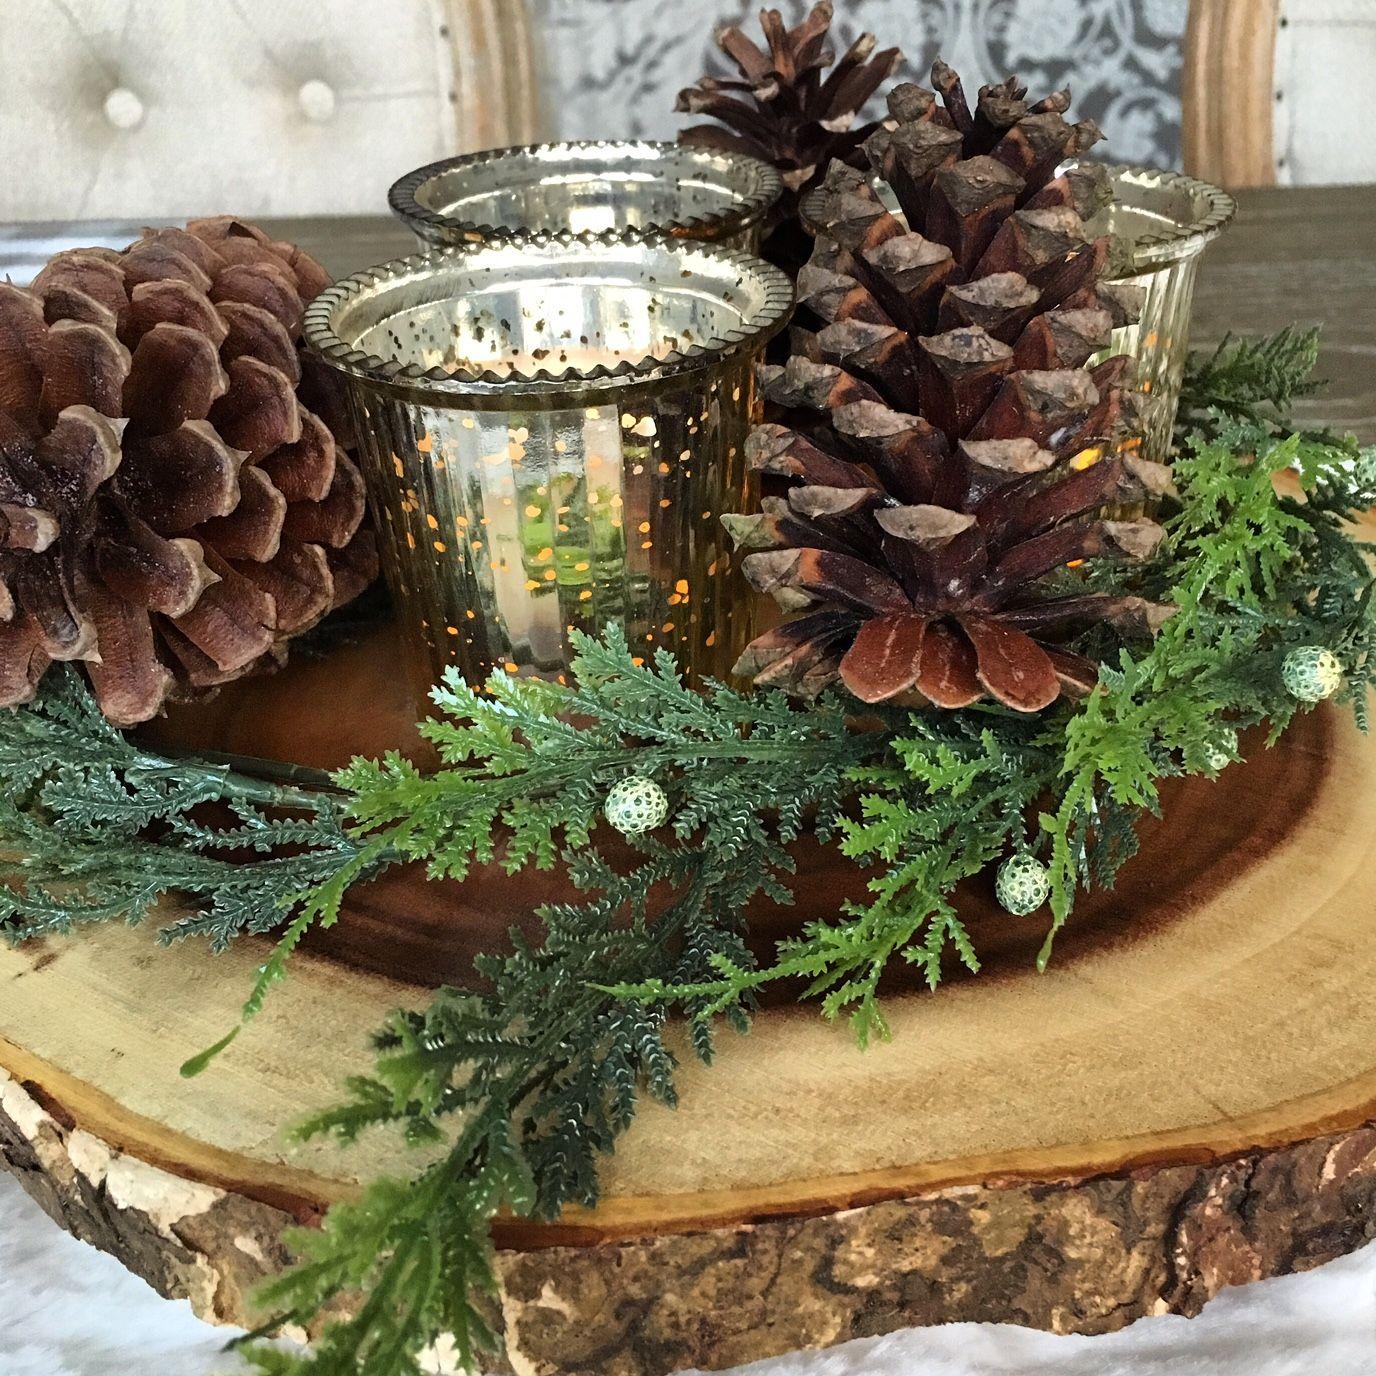 Wood Slab Centerpiece With Mercury Glass And Pine Cones C Rhiann Wynn Nolet Wood Centerpieces Wood Slab Centerpiece Wood Slice Centerpieces